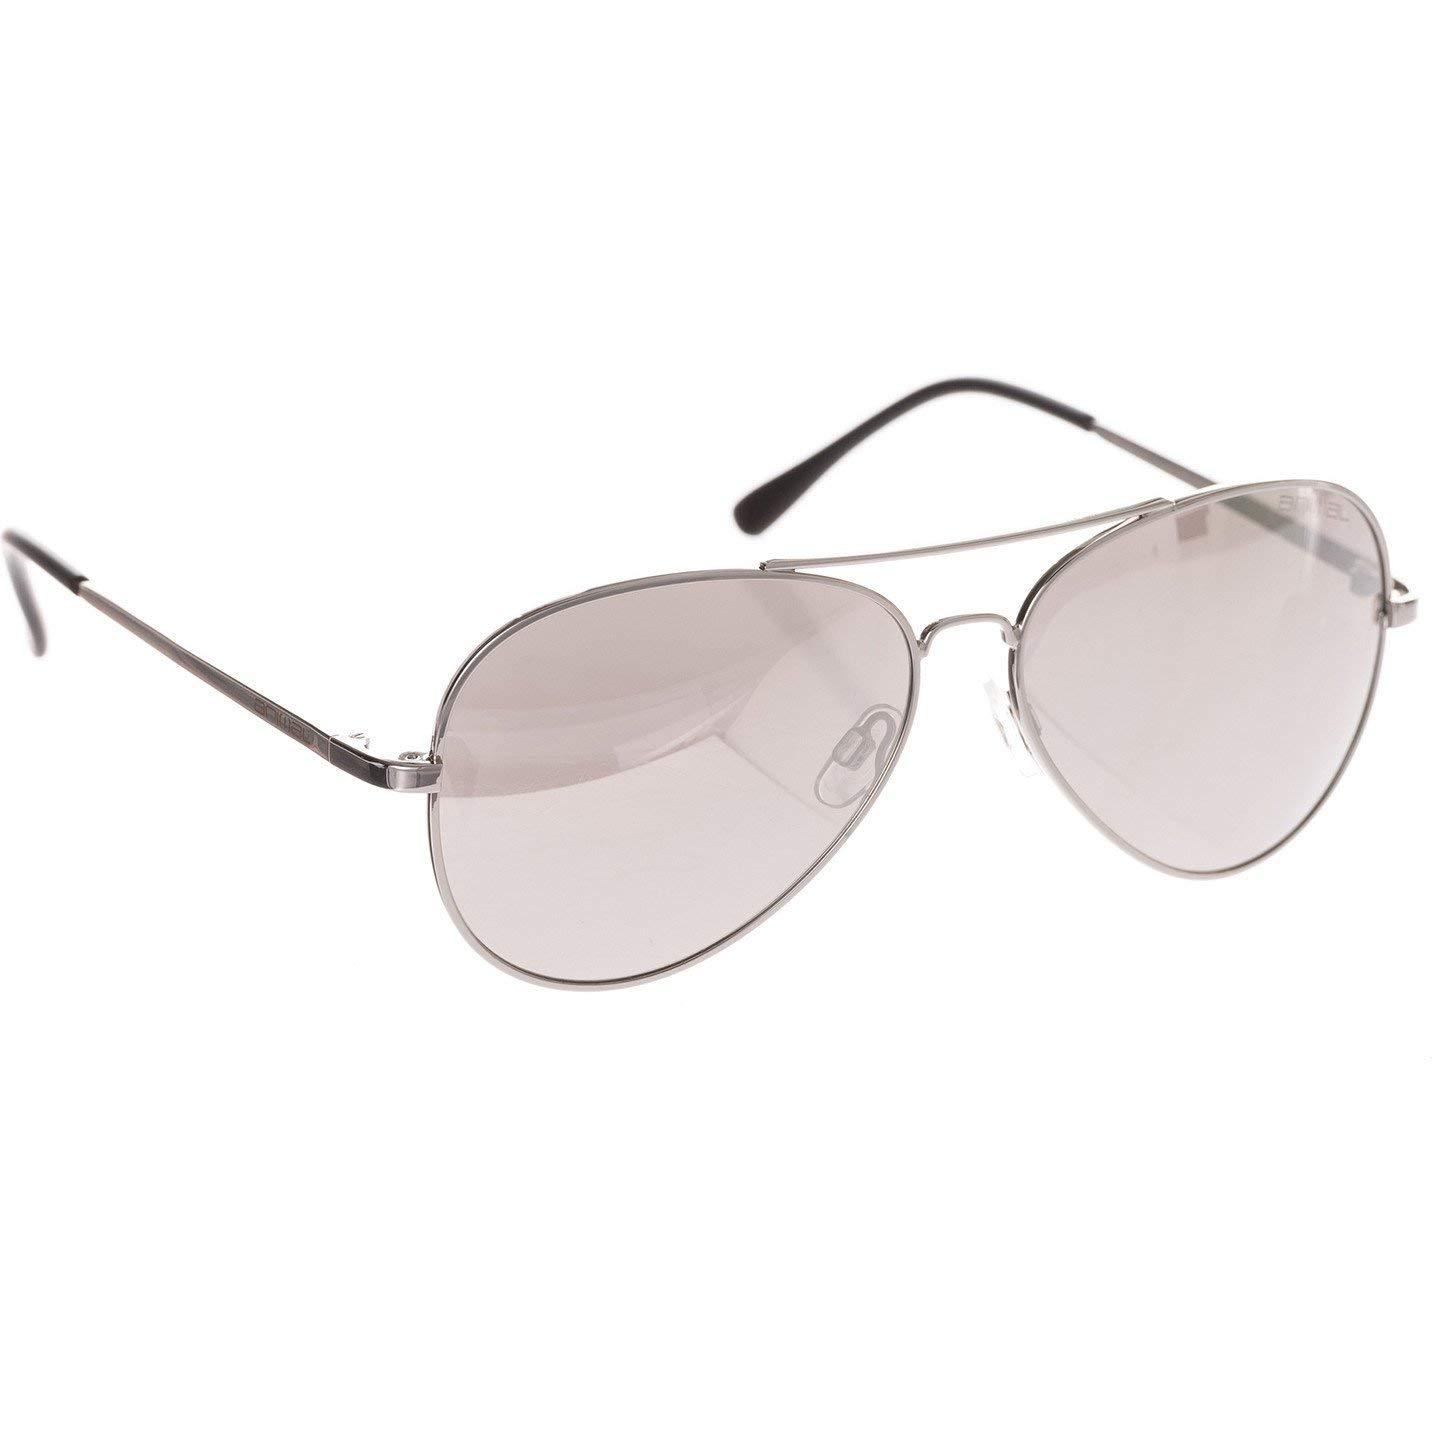 13d5c7d08021 Animal Jet Sunglasses - Silver / Smoke: Amazon.co.uk: Clothing